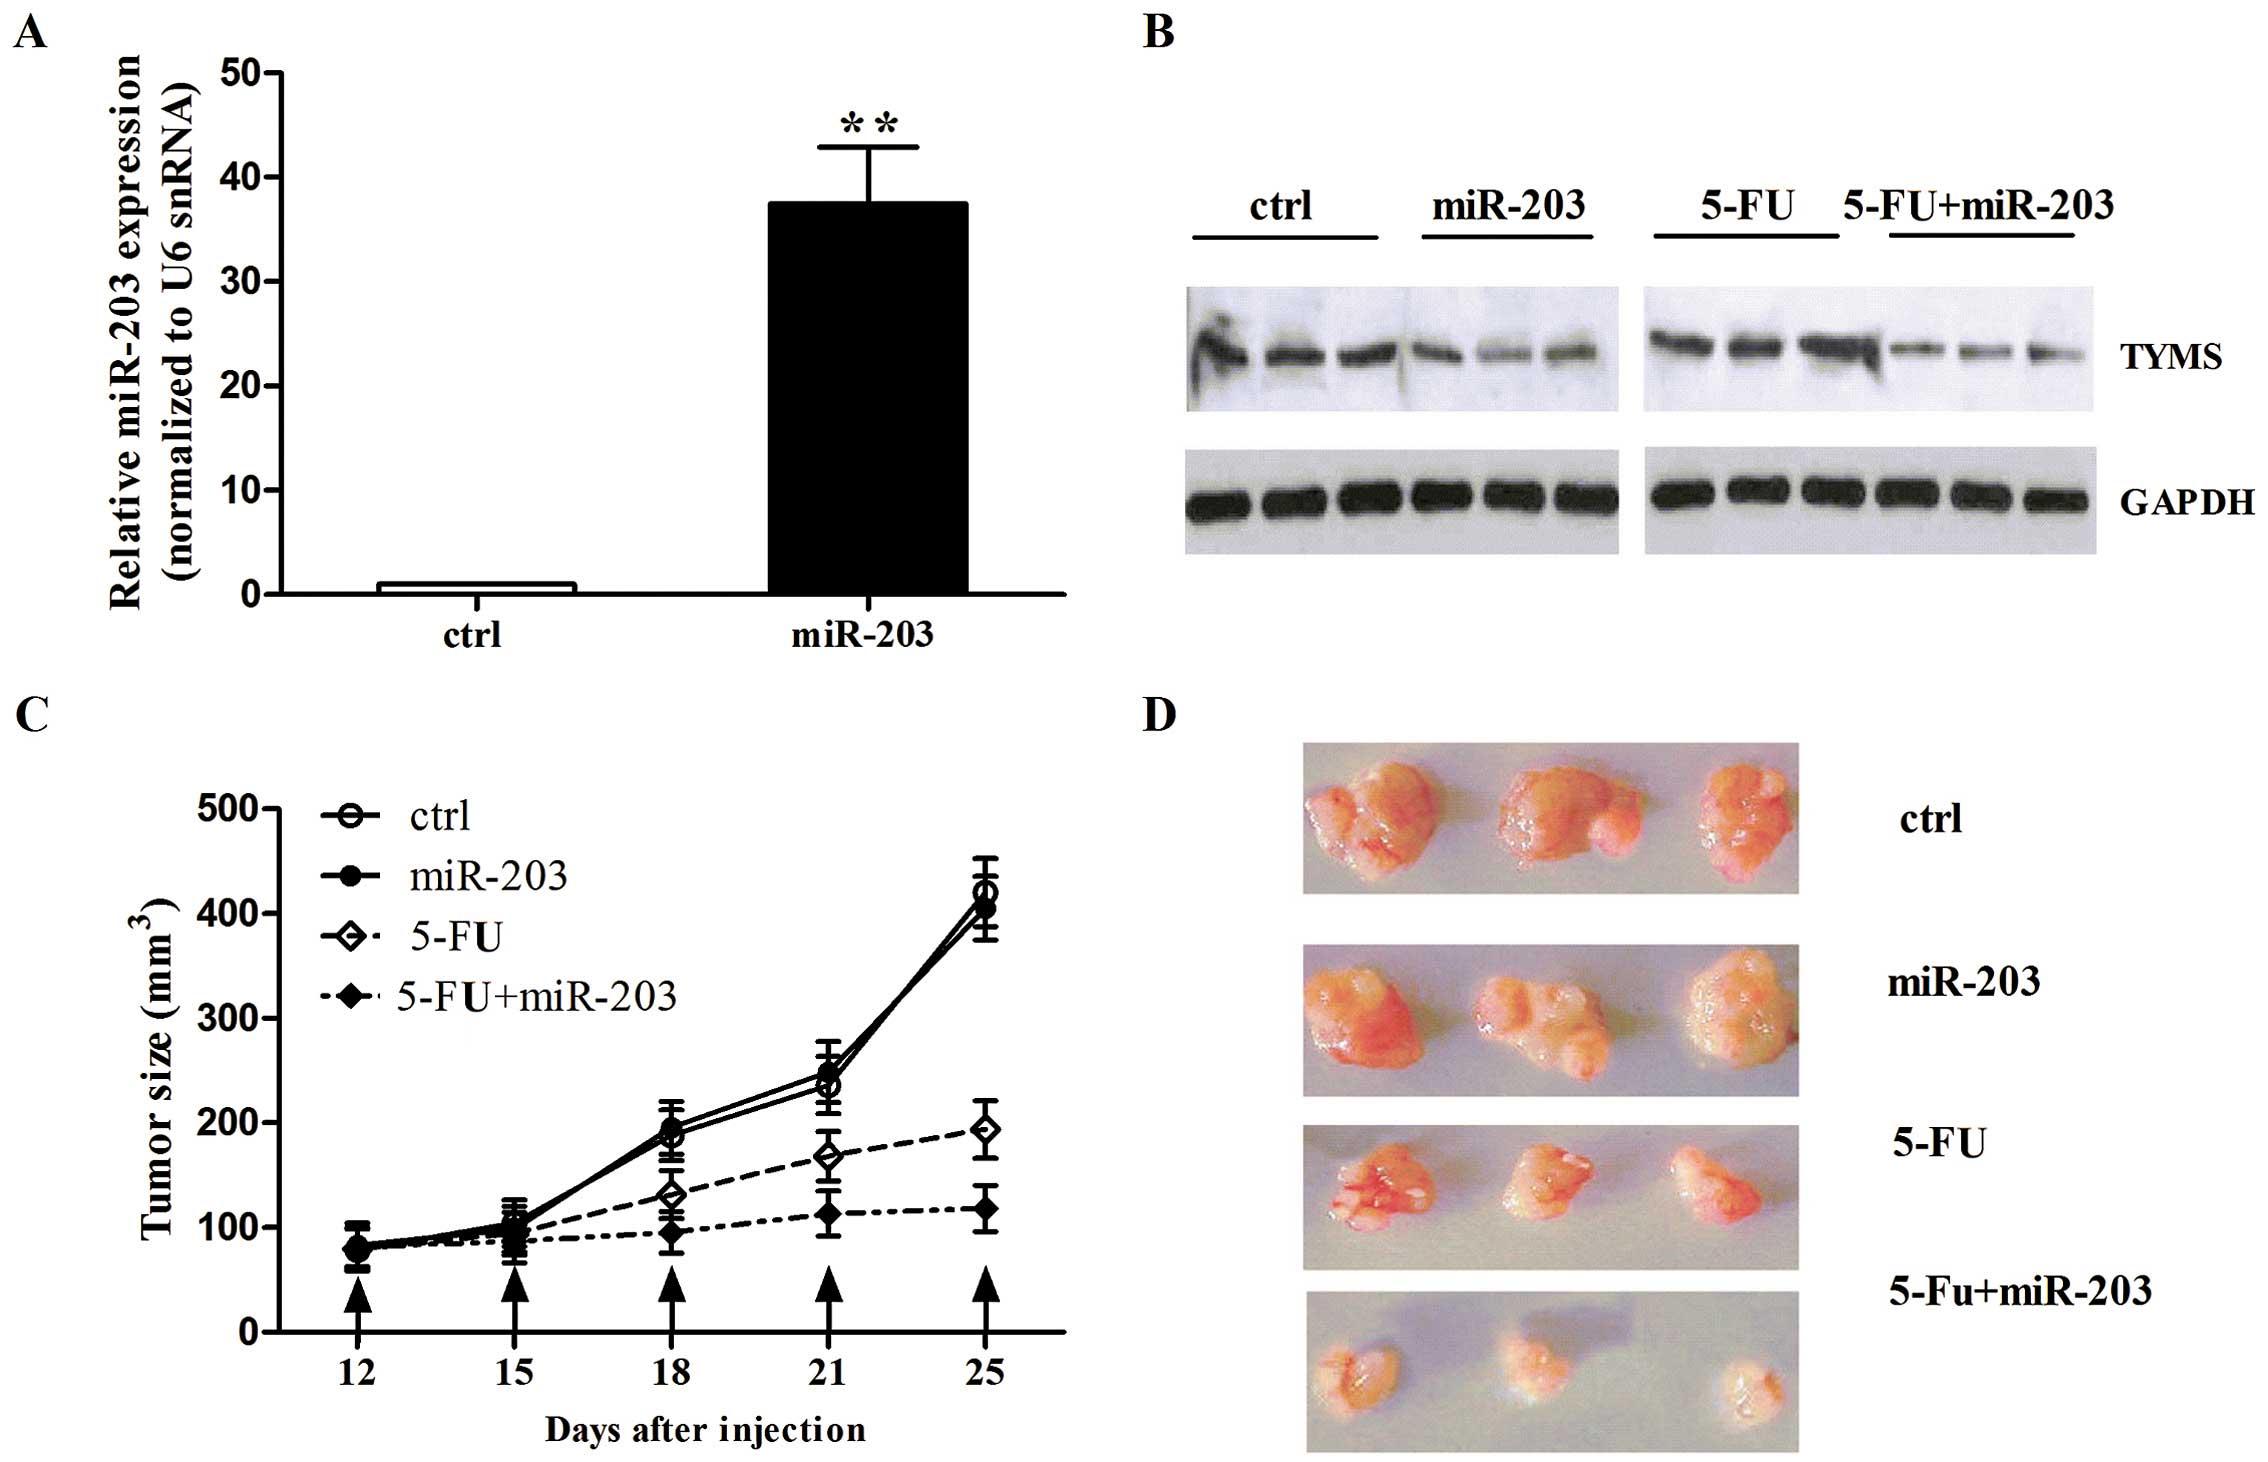 colorectal cancer 5-fluorouracil